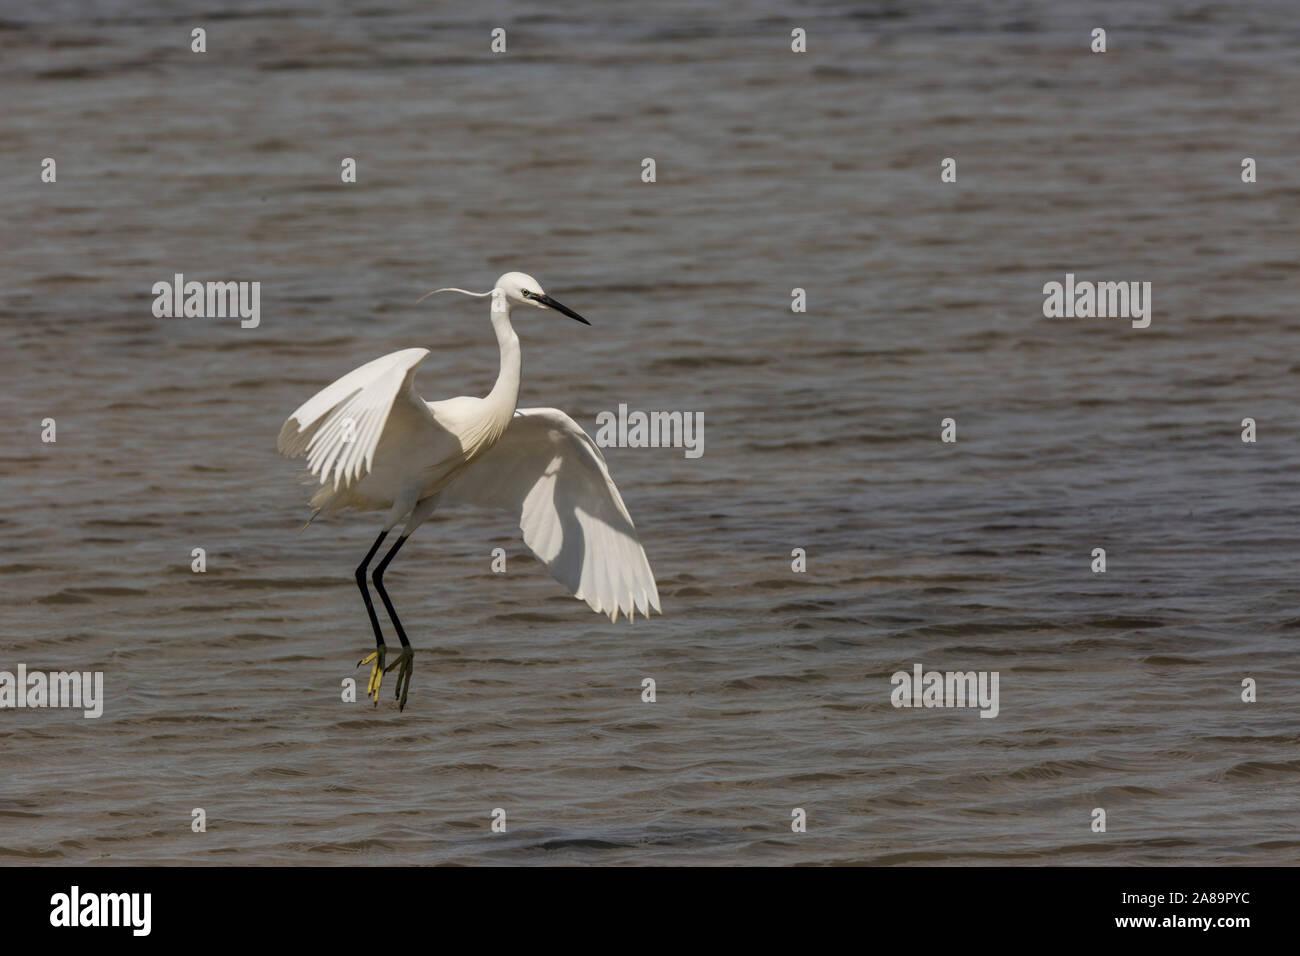 Little egret in Delta de l'Ebre Nature Park, Tarragona, Spain Stock Photo